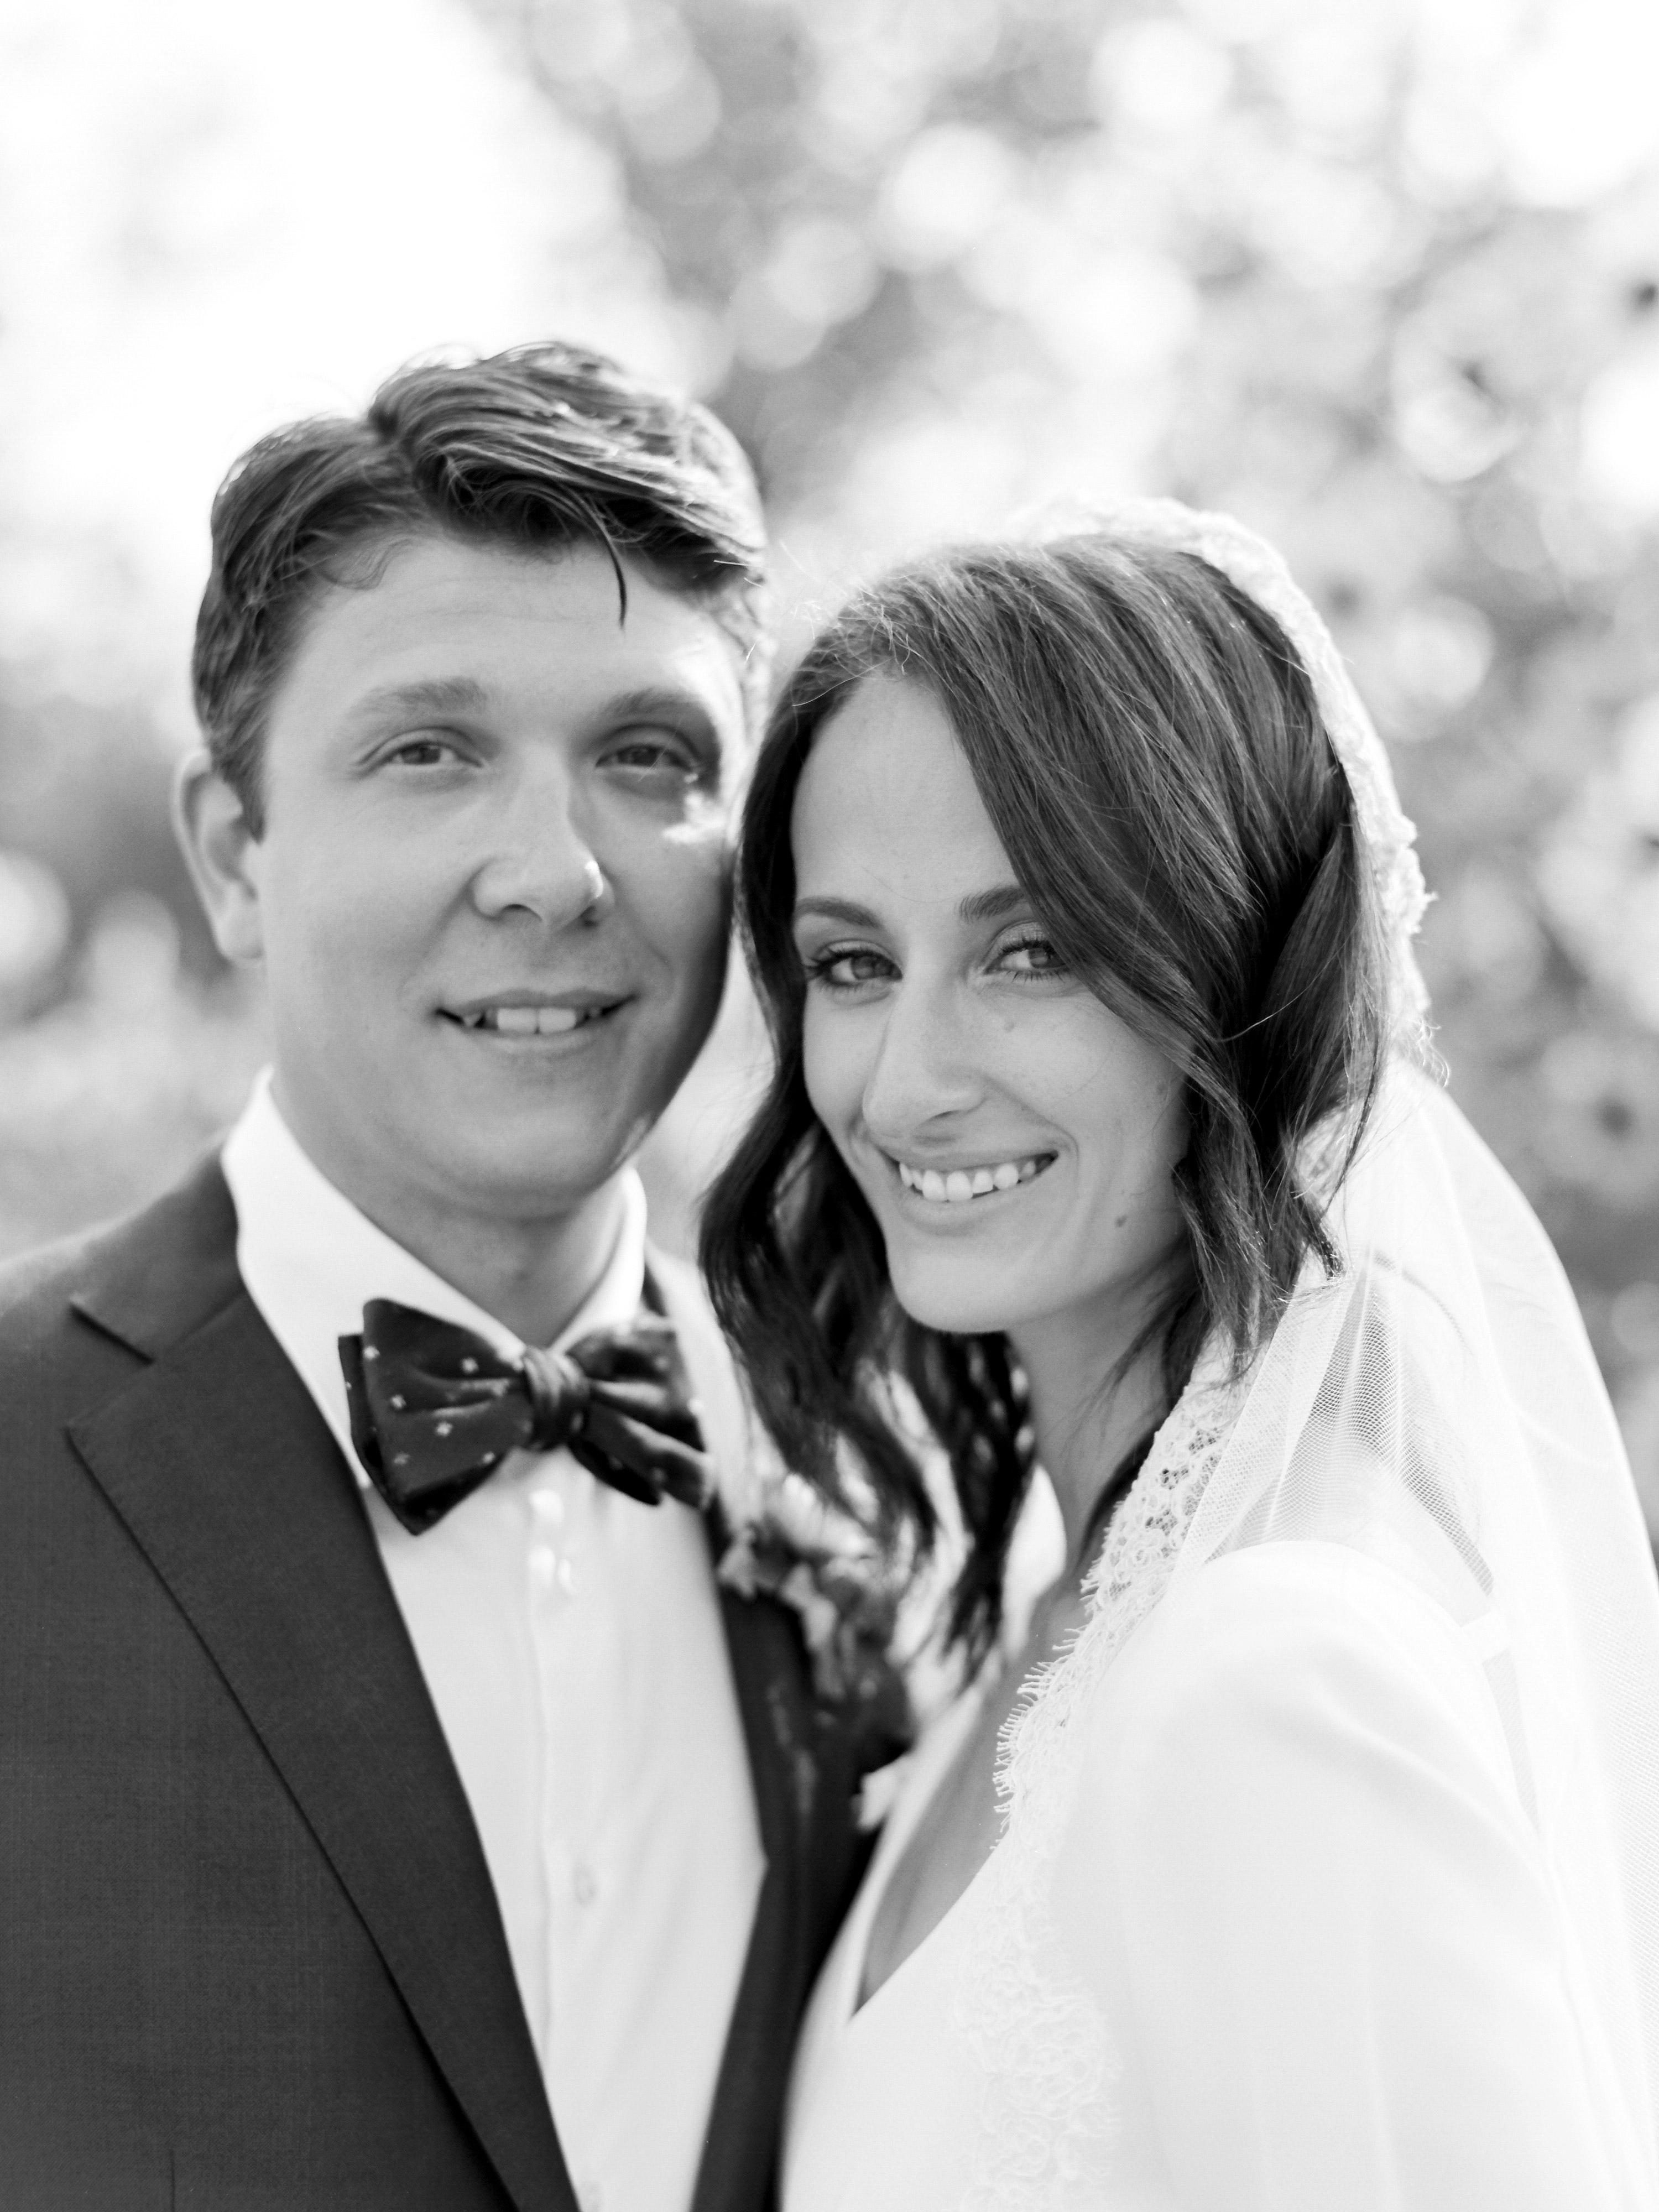 kayla michael wedding couple smile embrace